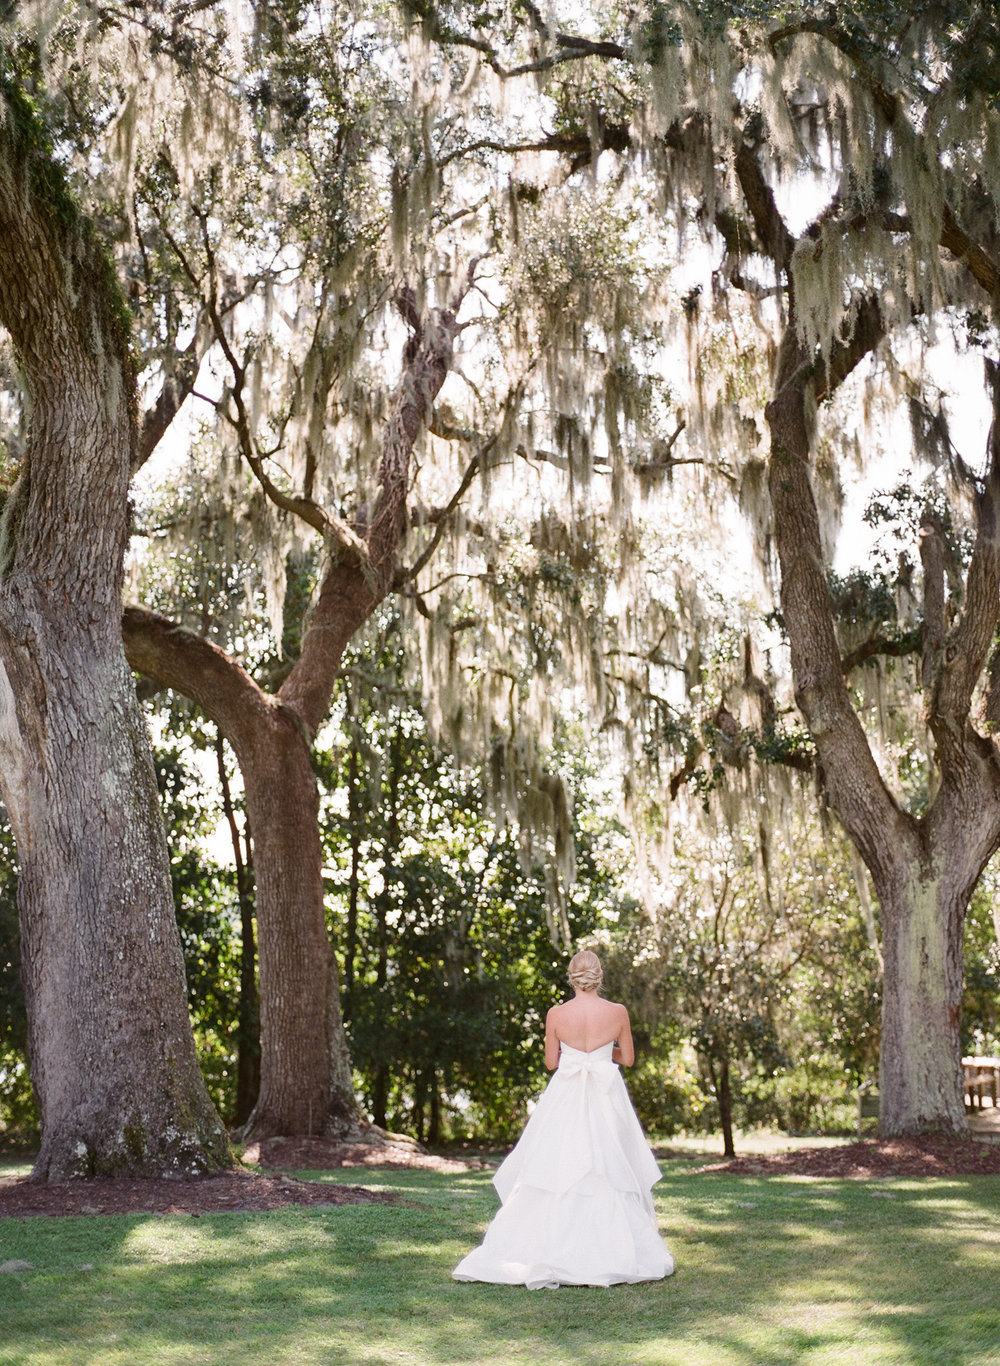 Airlie-Gardens-Wedding-14.jpg